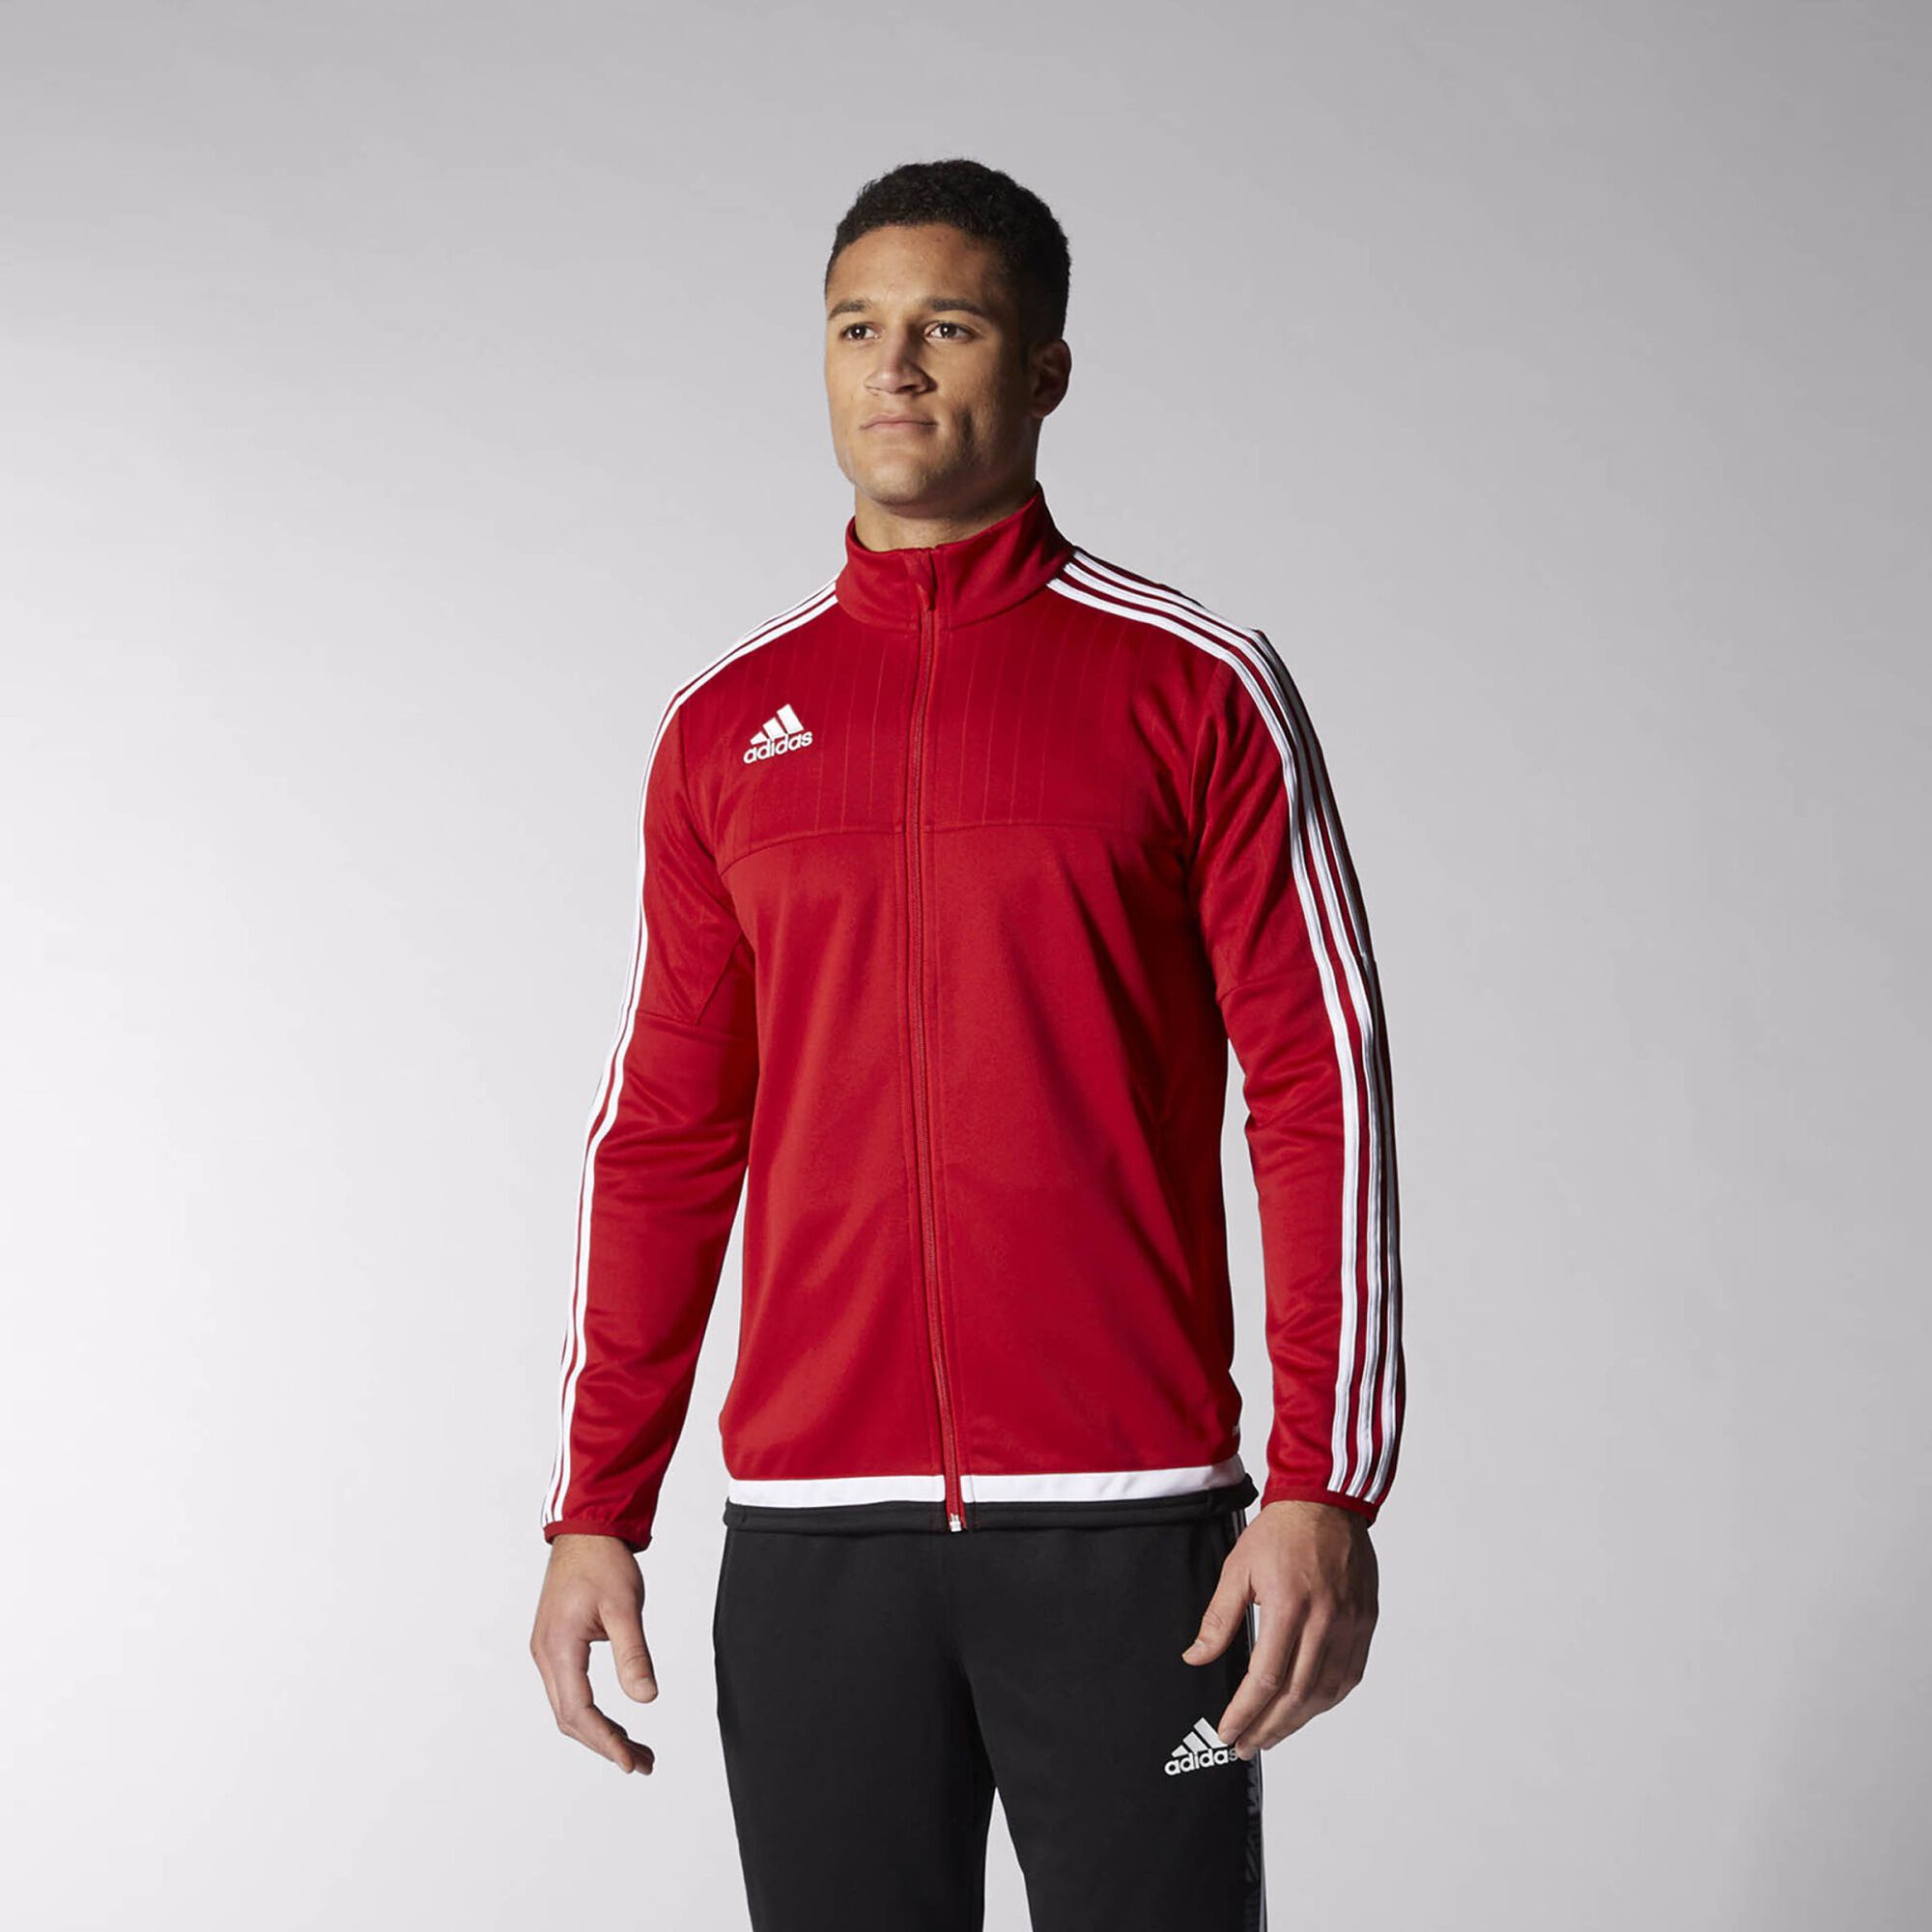 Jackets: Rain, Winter, Track & Sports Jackets | adidas US